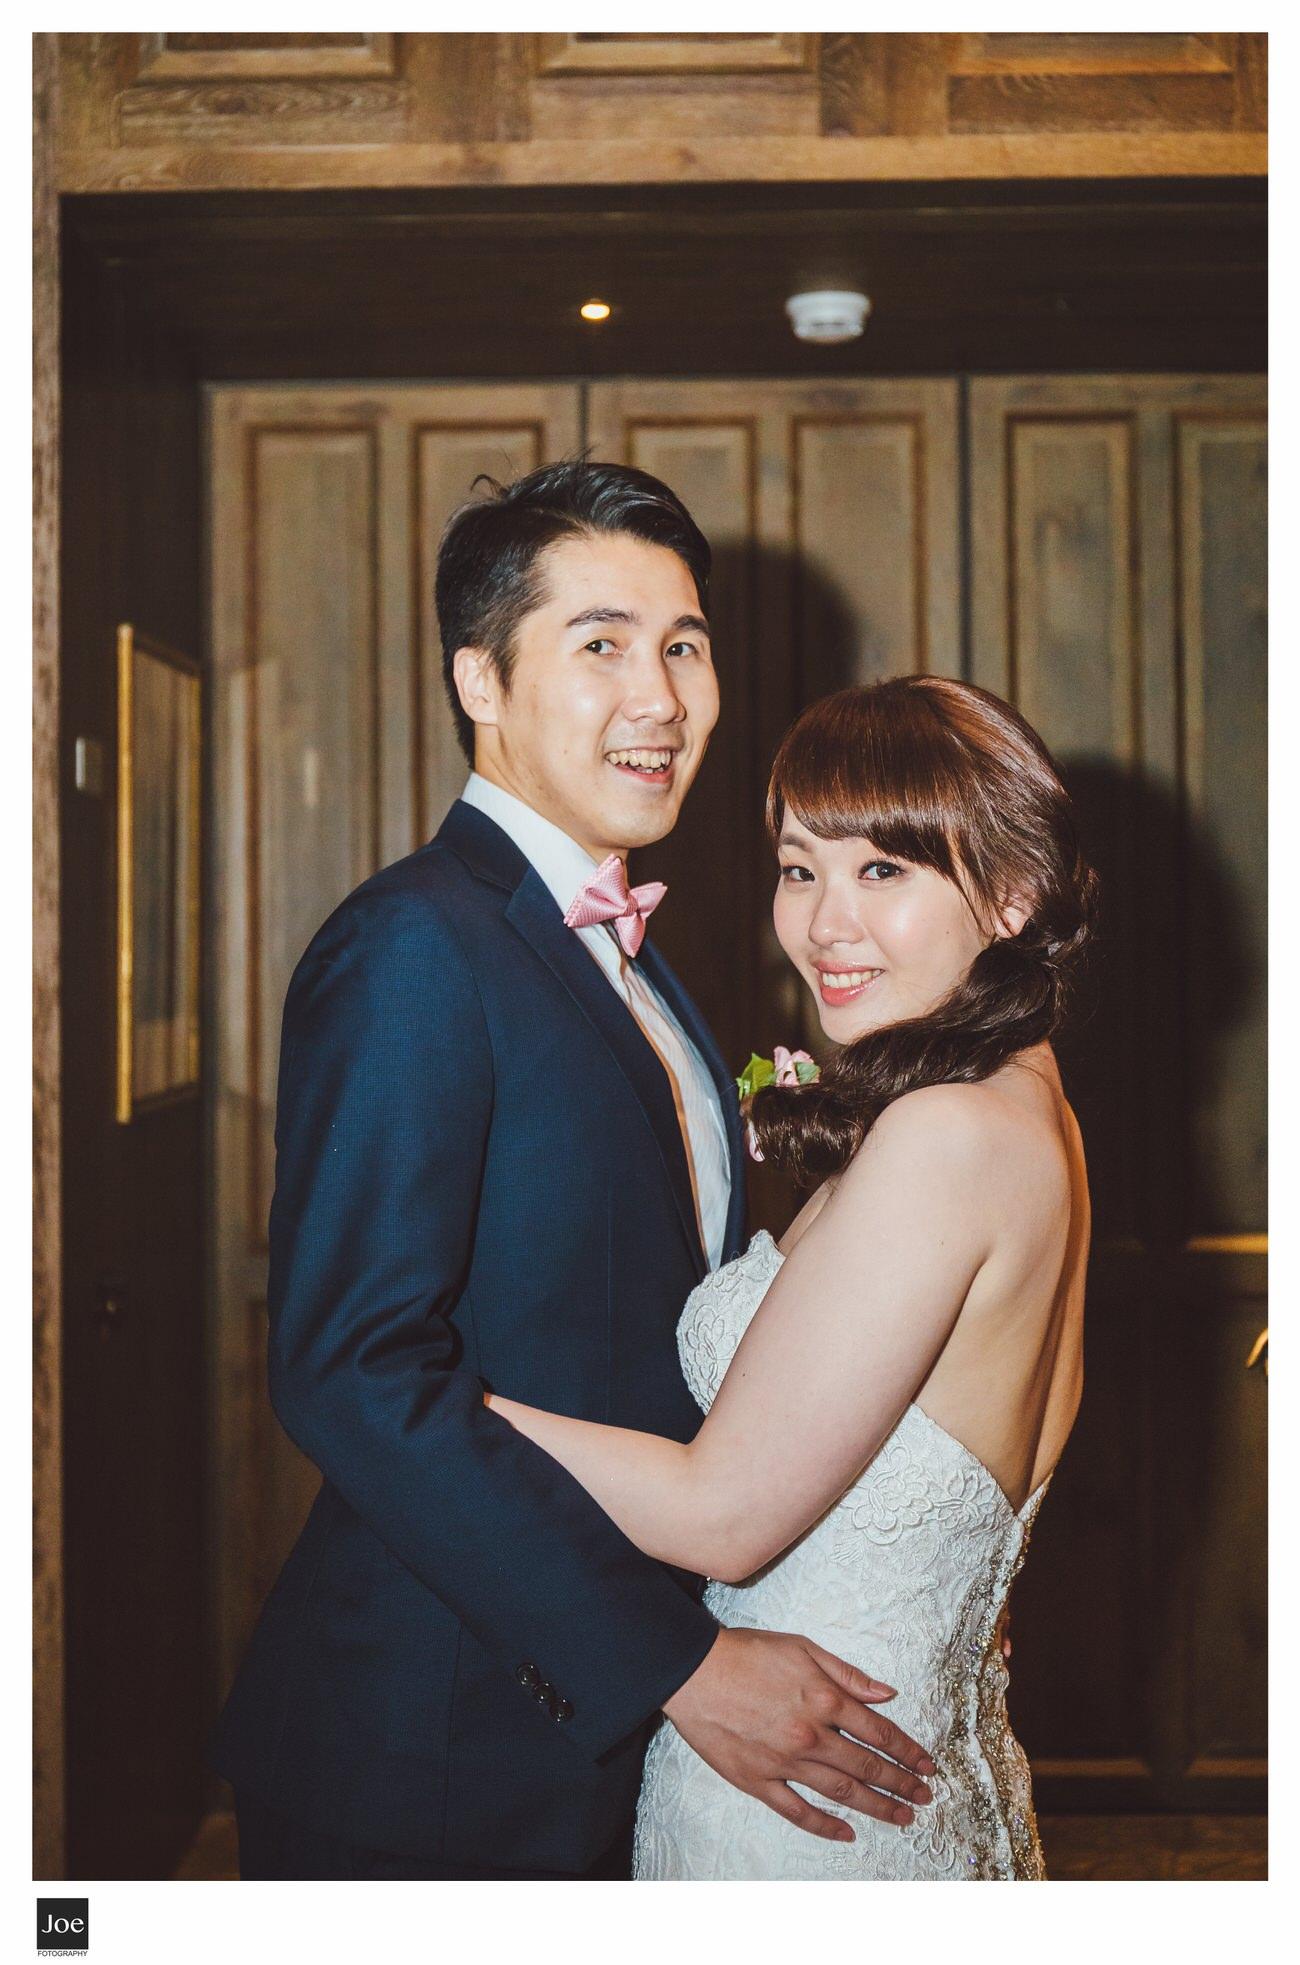 joe-fotography-wedding-photo-palais-de-chine-hotel-073.jpg